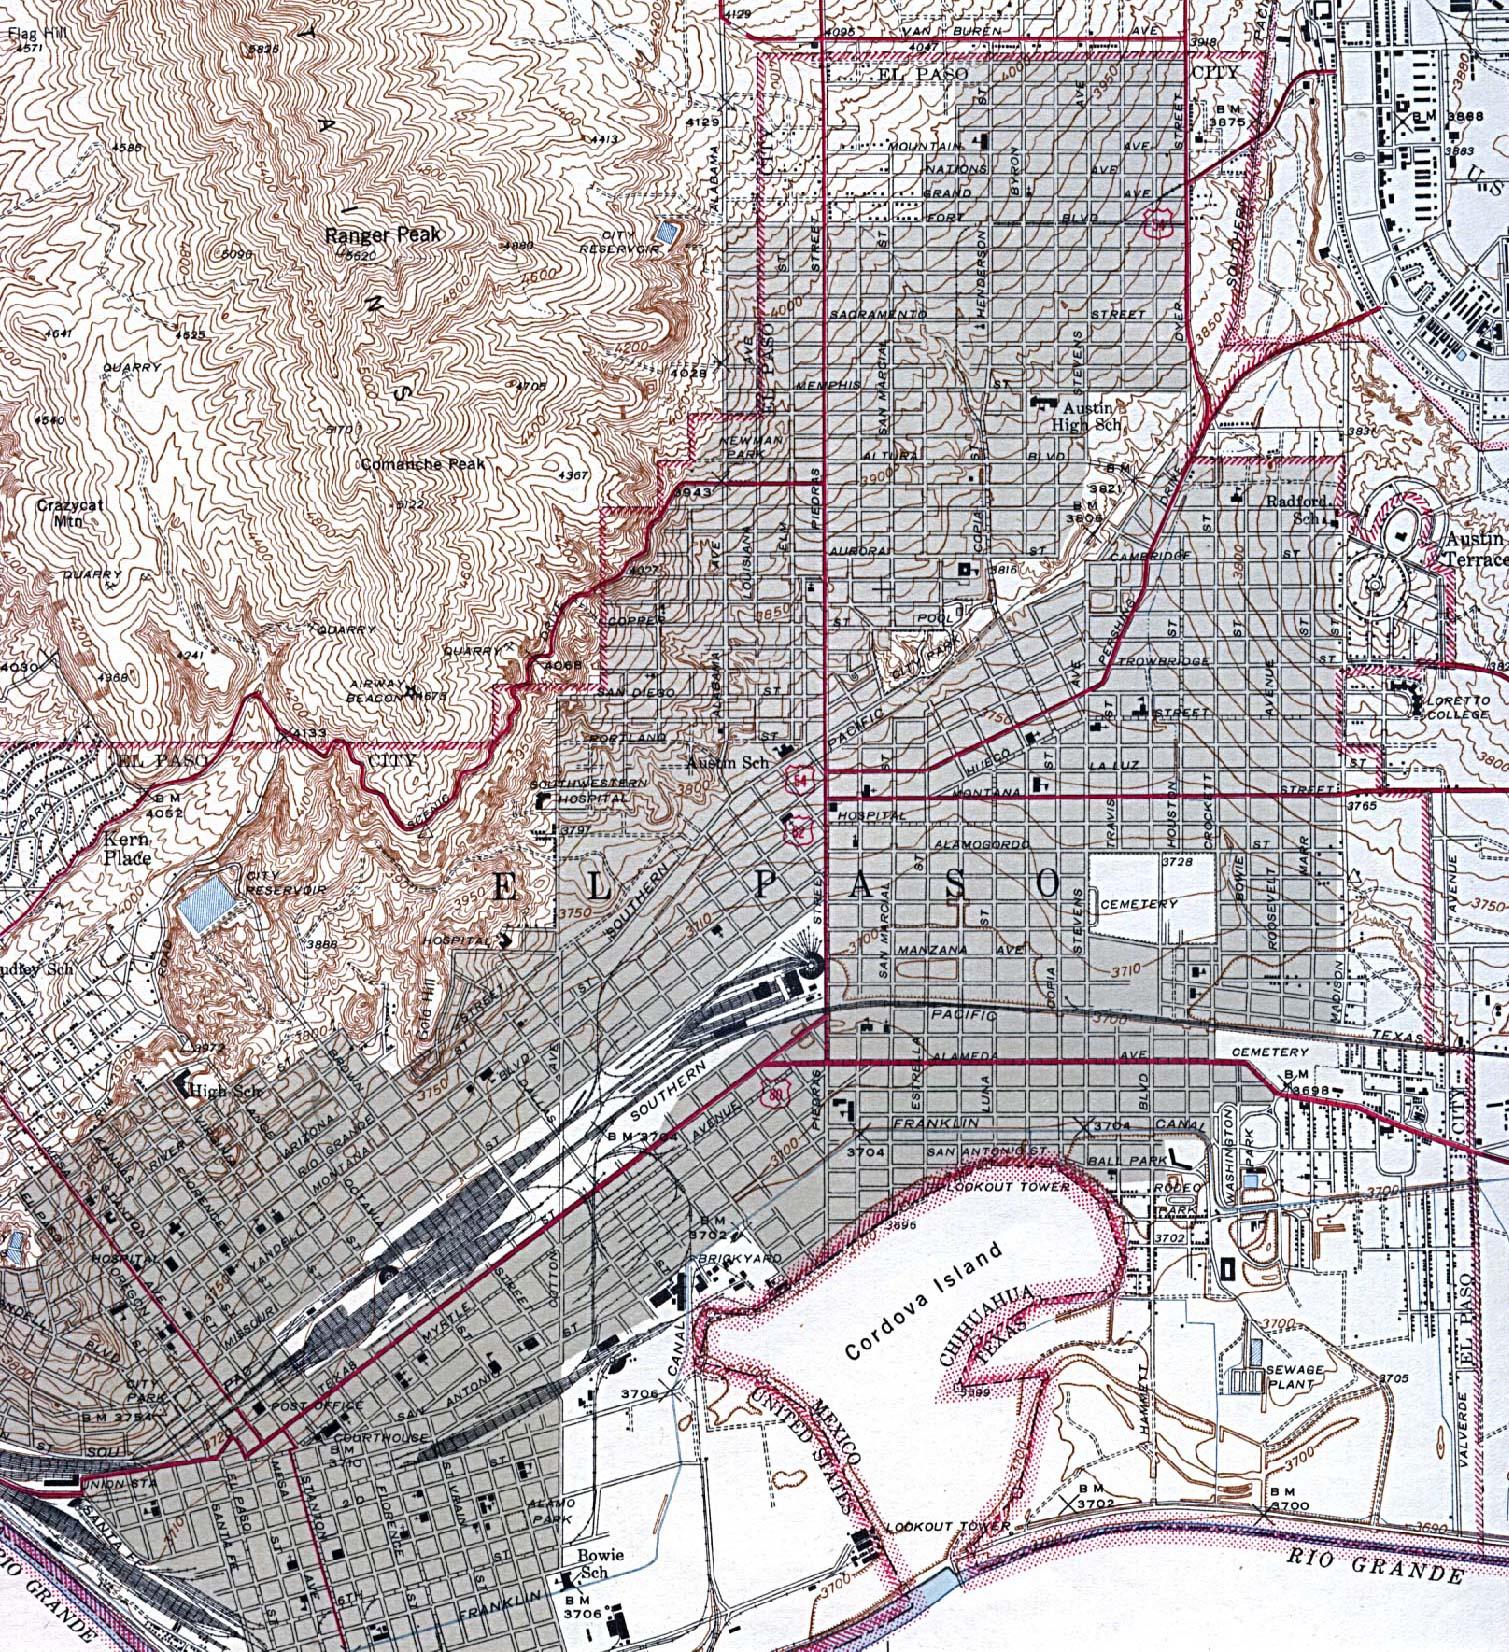 Historical Maps of U.S Cities. El Paso, Texas 1943 Original Scale 1:31,680. U.S. Geological Survey (975K)